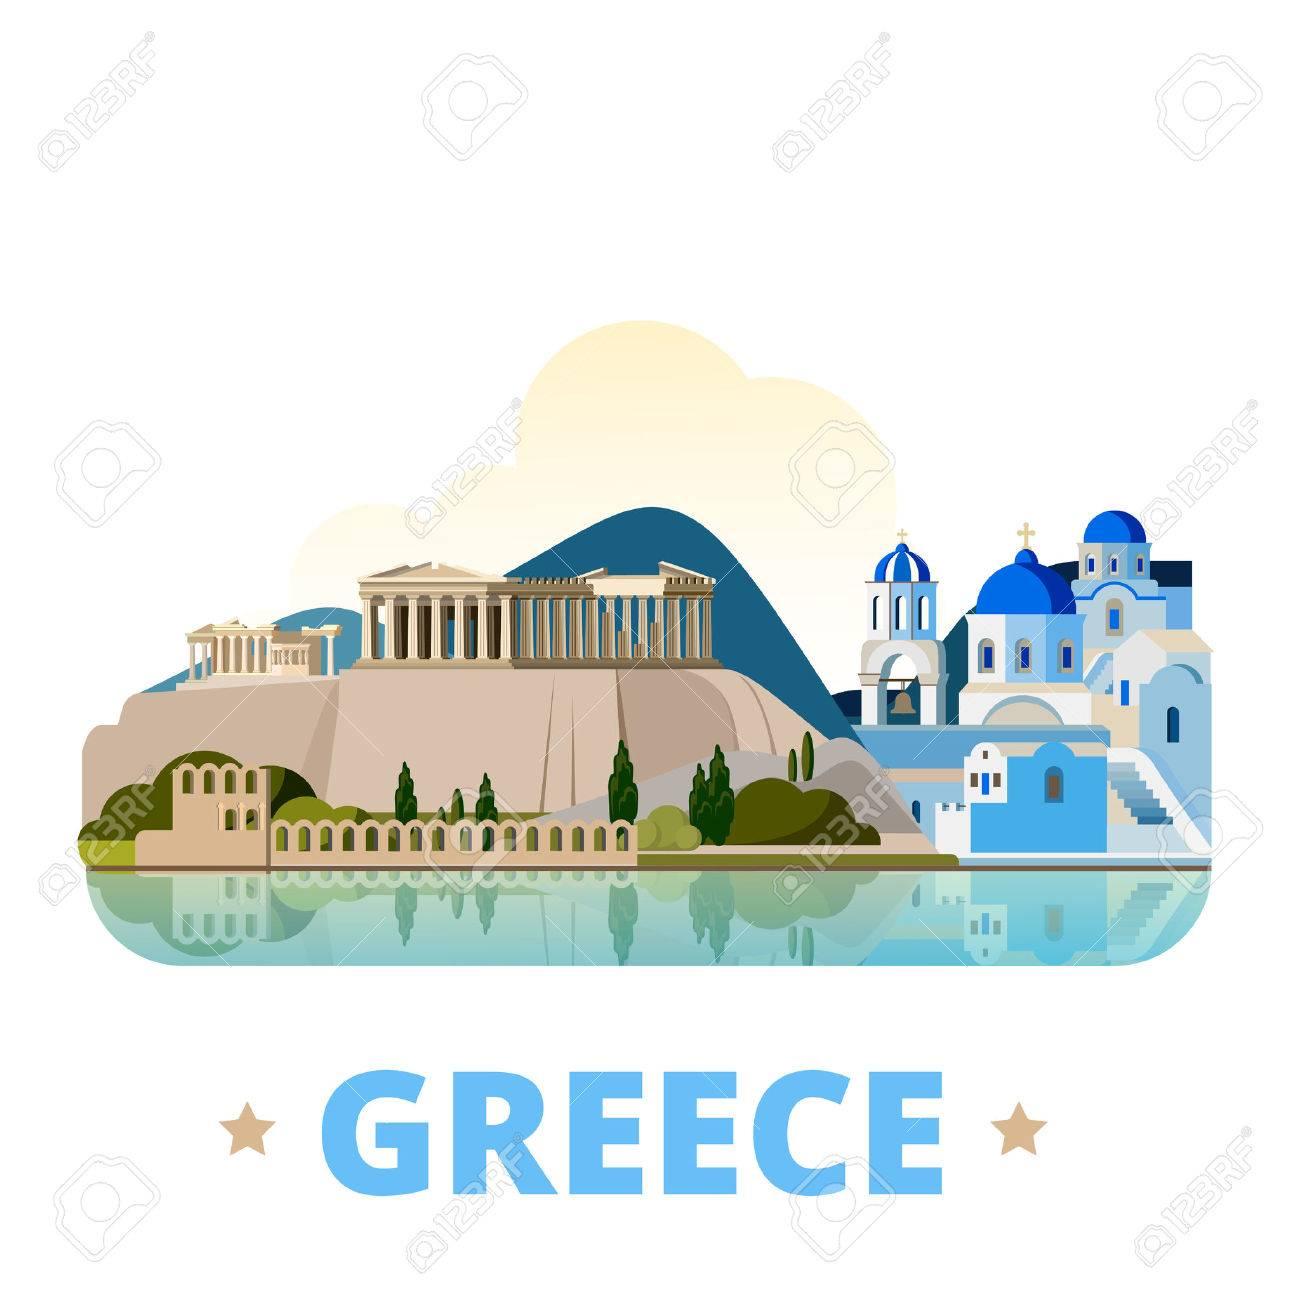 Greece country design template. Flat cartoon style historic sight showplace web vector illustration. World vacation travel Europe European collection. Santorini Aegean Sea Islands Acropolis of Athens - 58835946